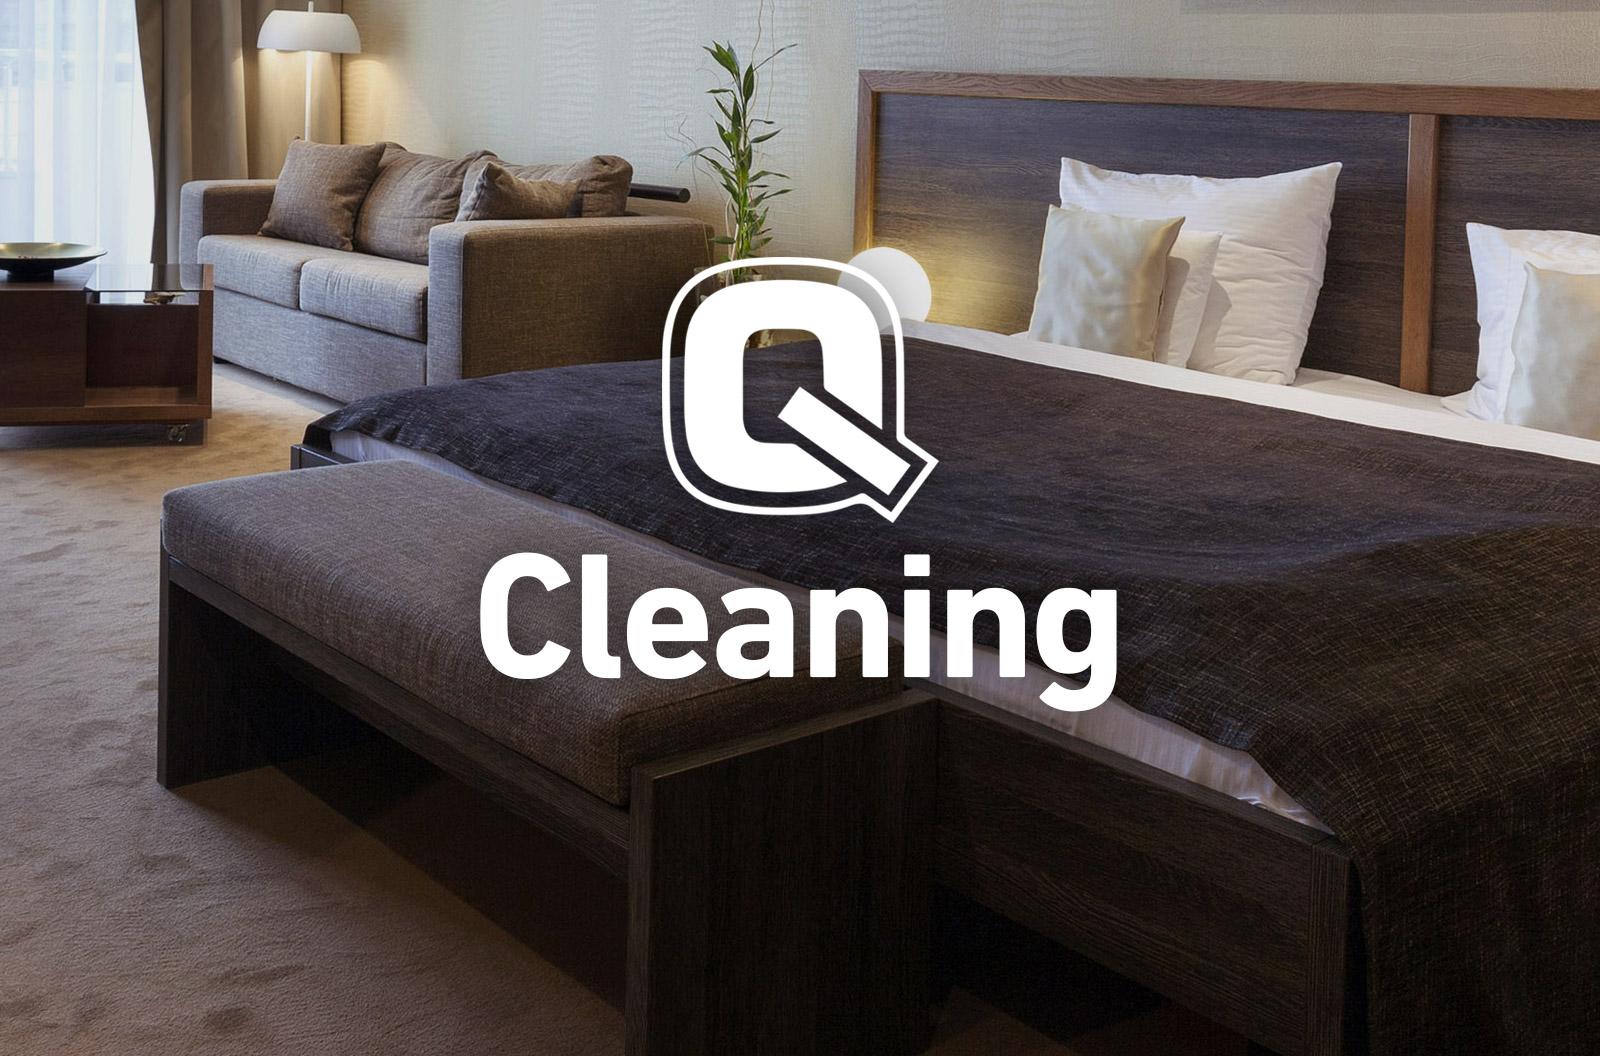 Quimidex Cleaning